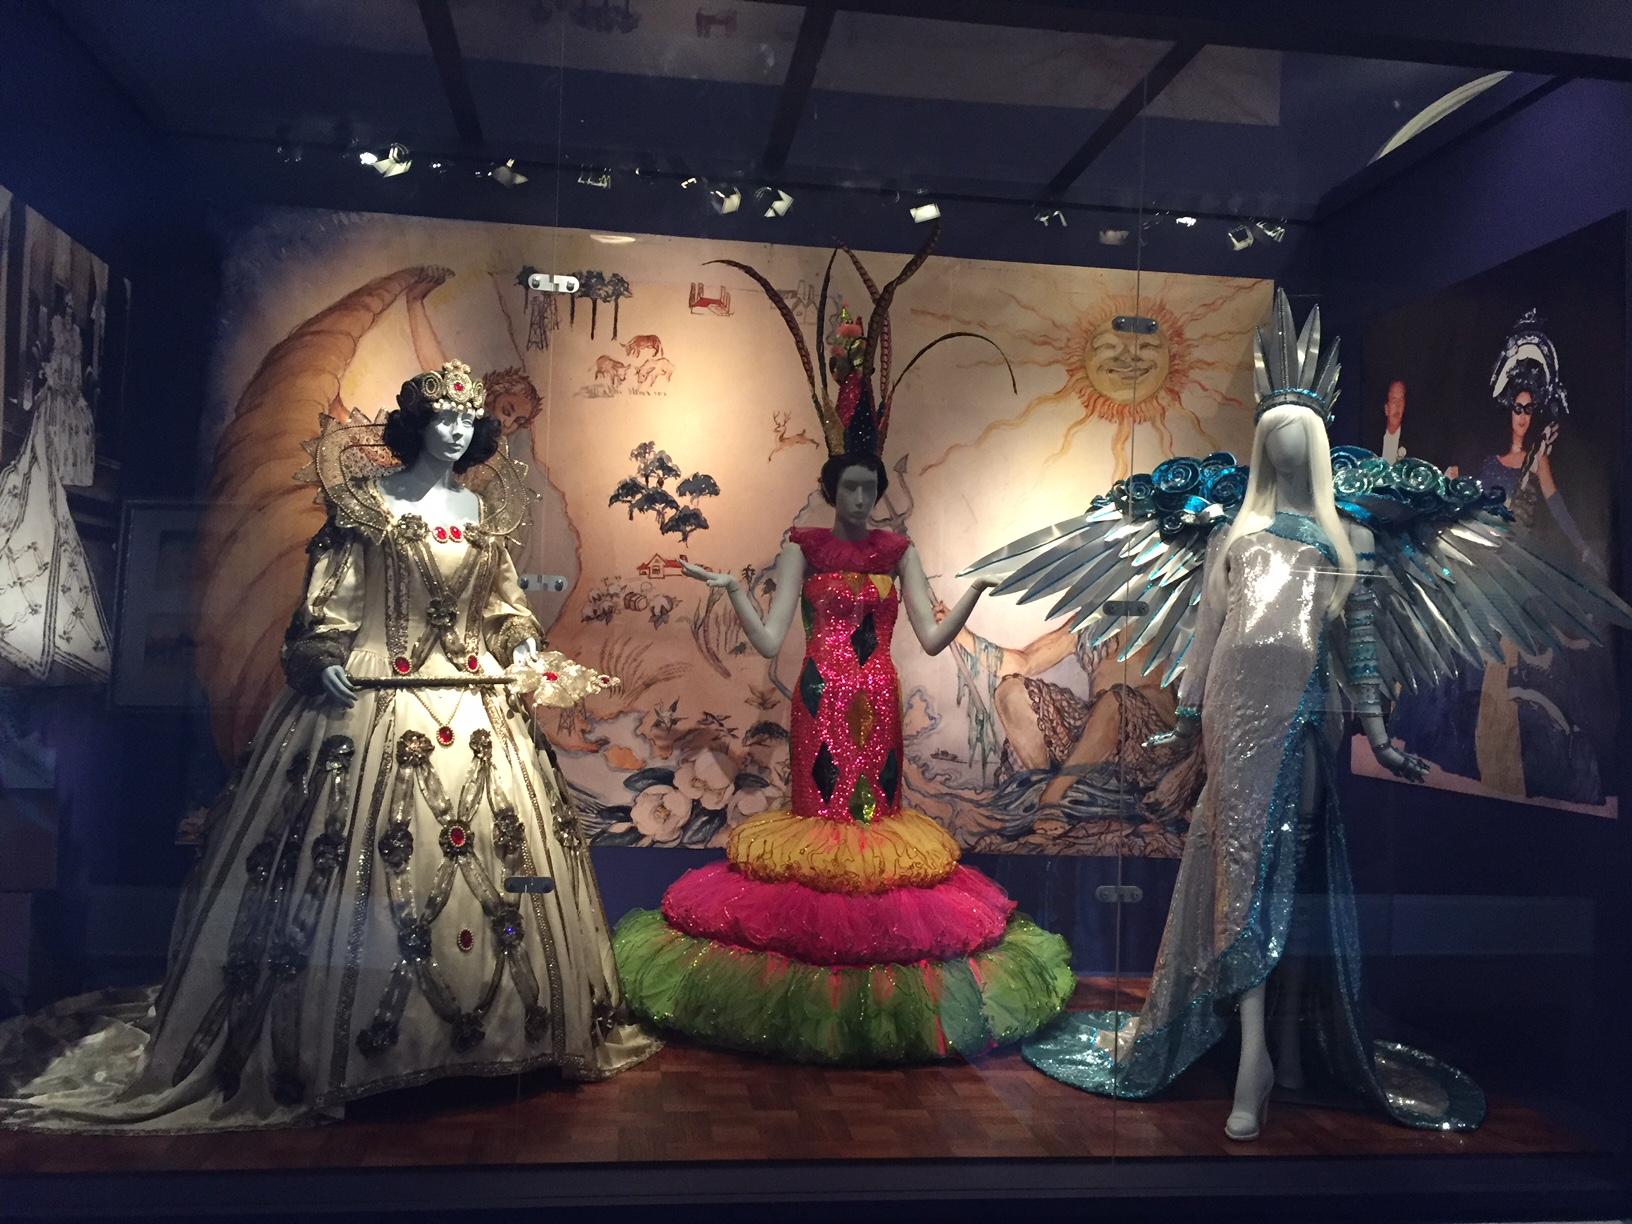 It's absolutely worth it to tour their Mardi Gras exhibit.